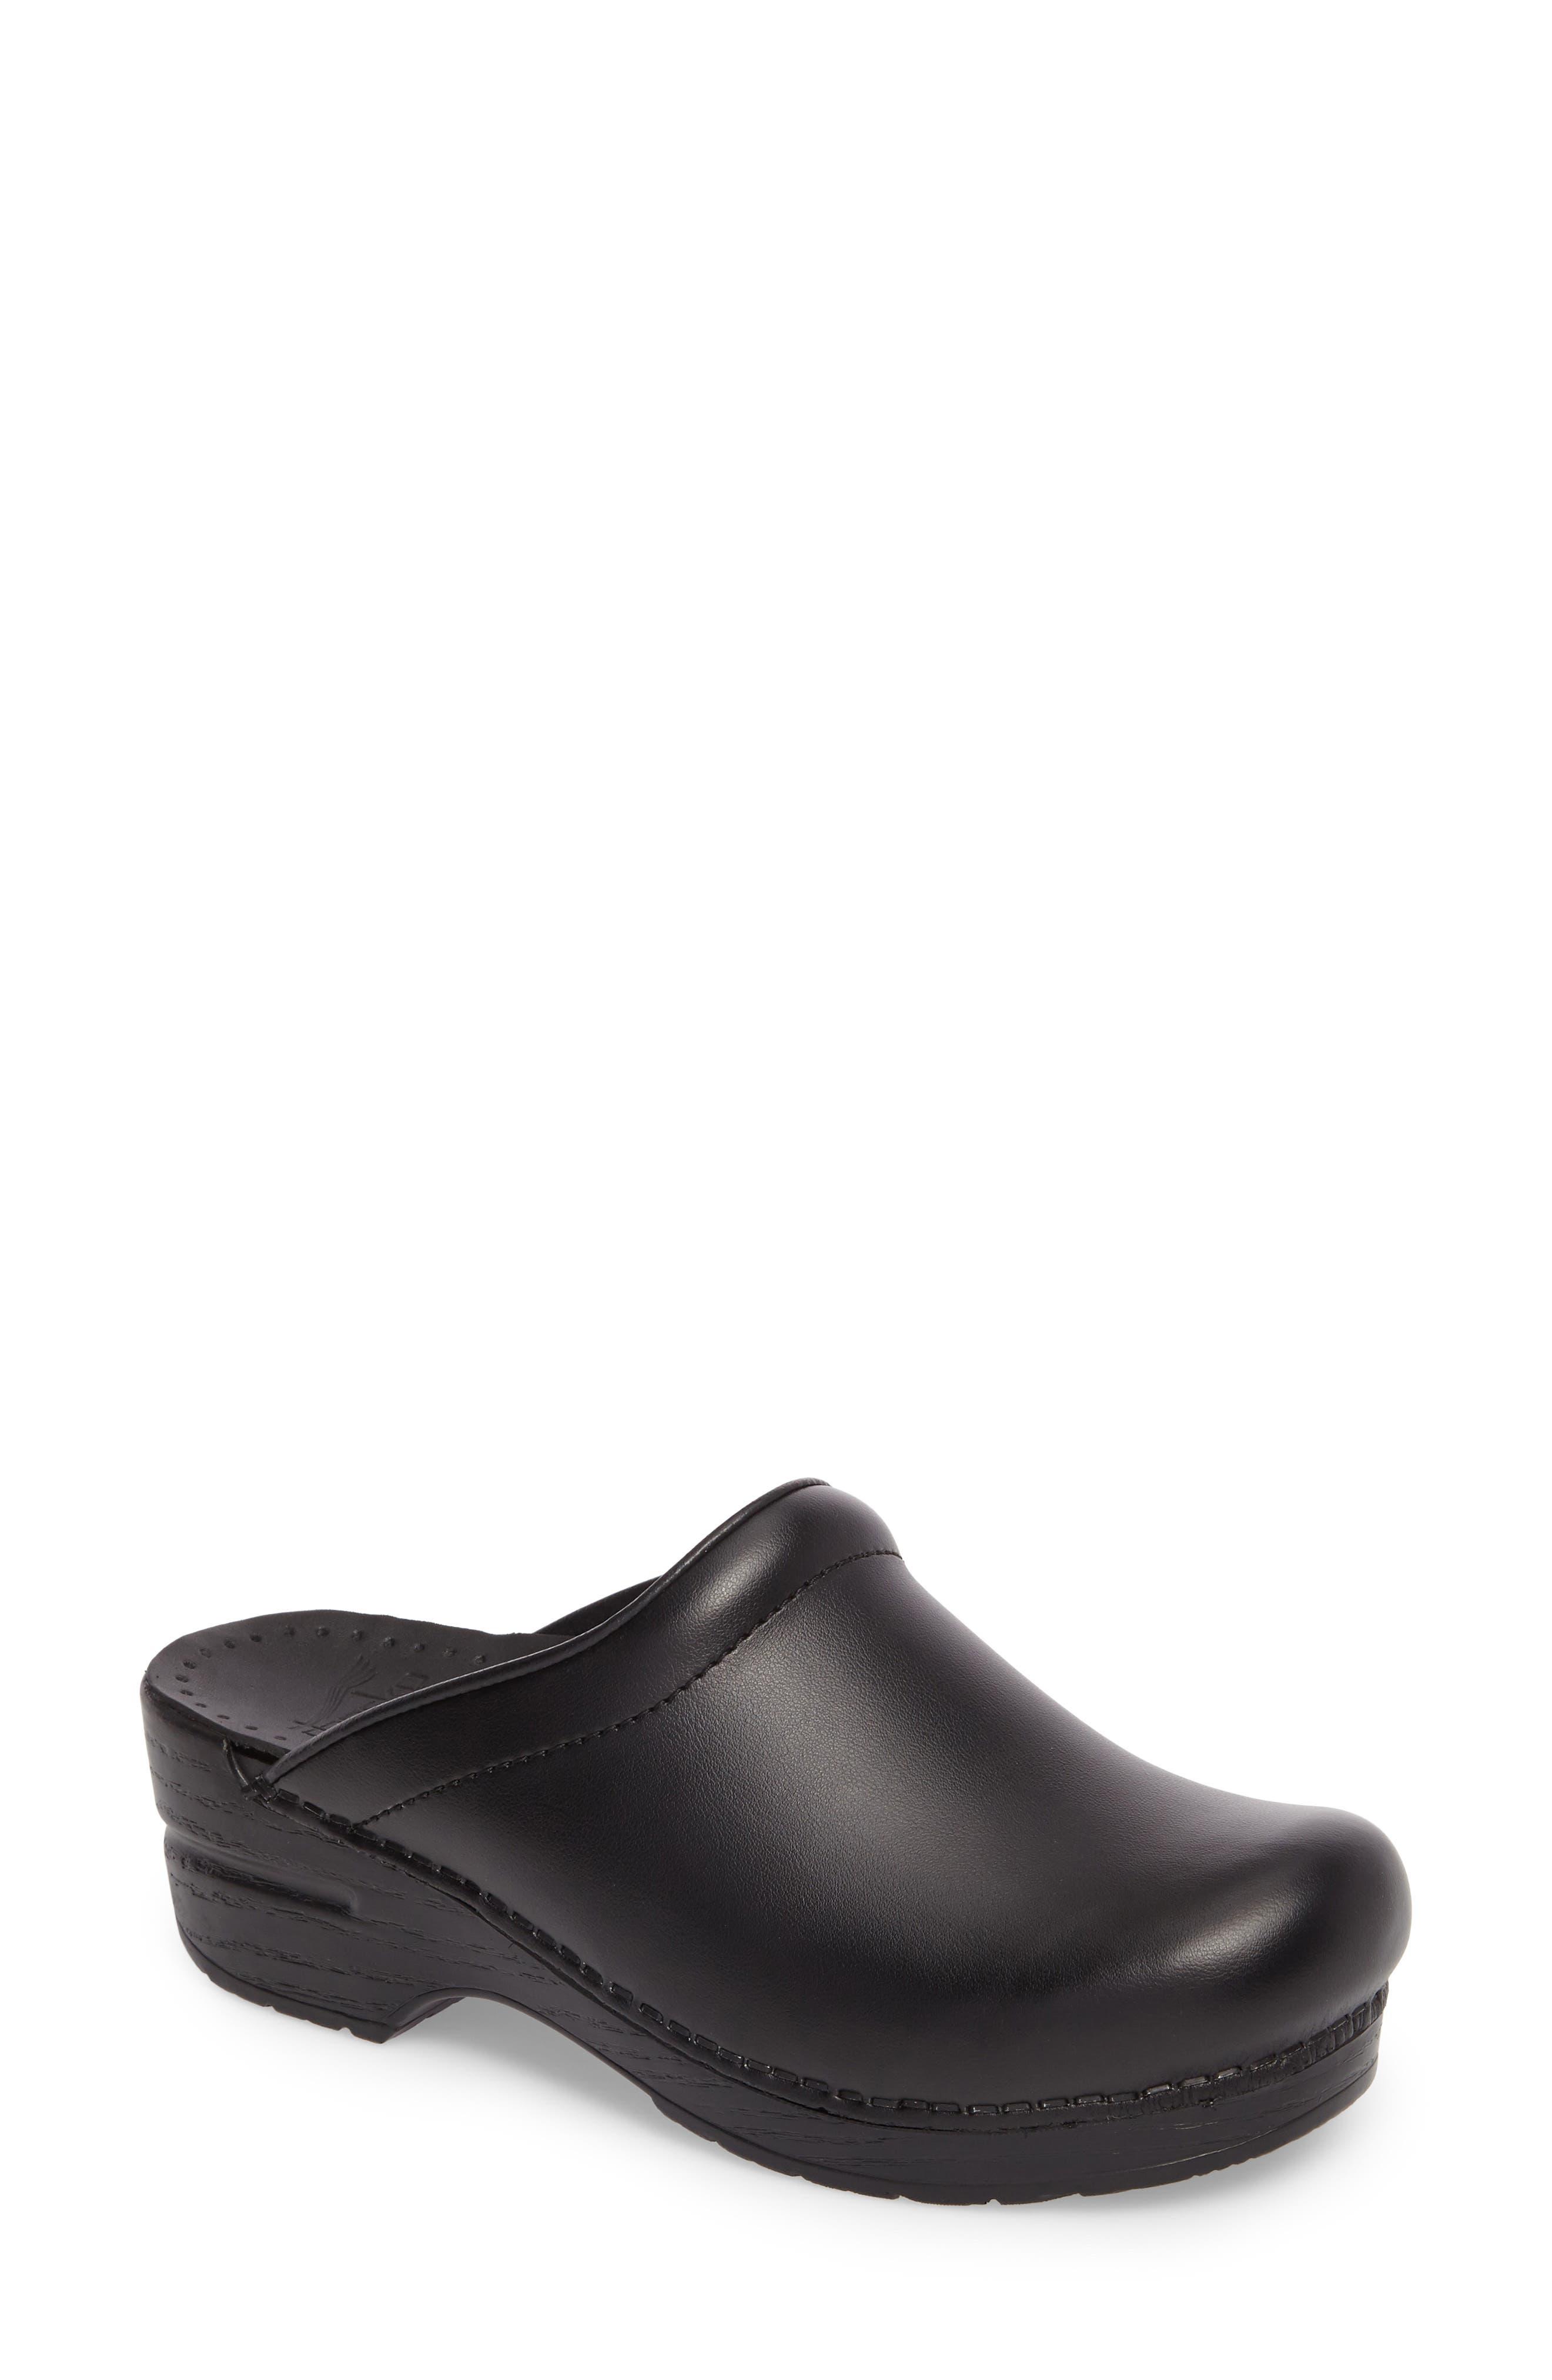 'Sonja' Patent Leather Clog,                         Main,                         color, BLACK BOX LEATHER